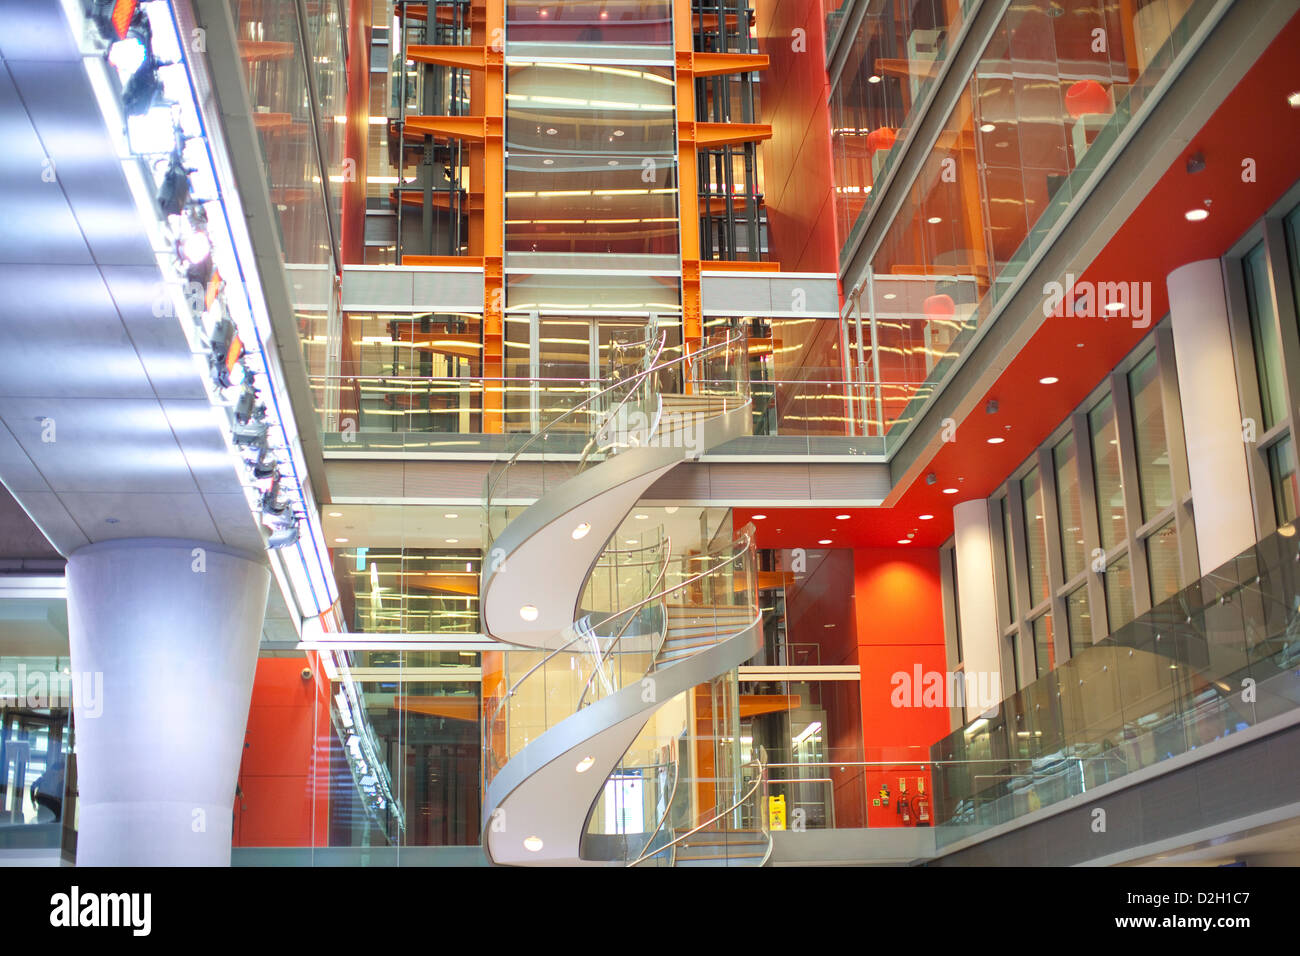 High-tech hub of BBC Global News newsroom, British Broadcasting House, Portland Place, London, United Kingdom - Stock Image